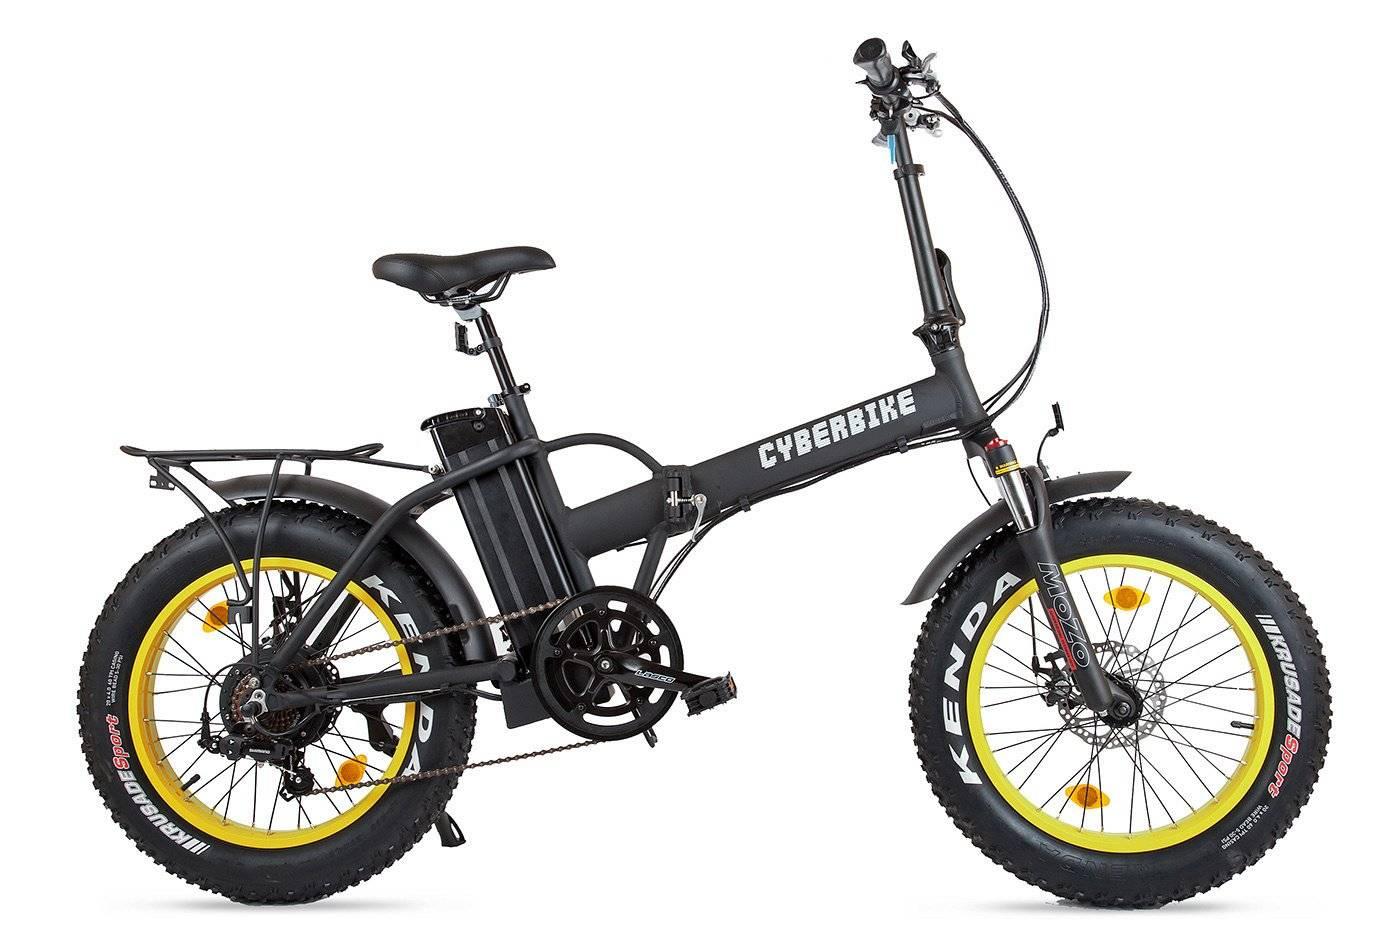 Велогибрид Cyberbike 500 Вт, 019282-1906, фото 3